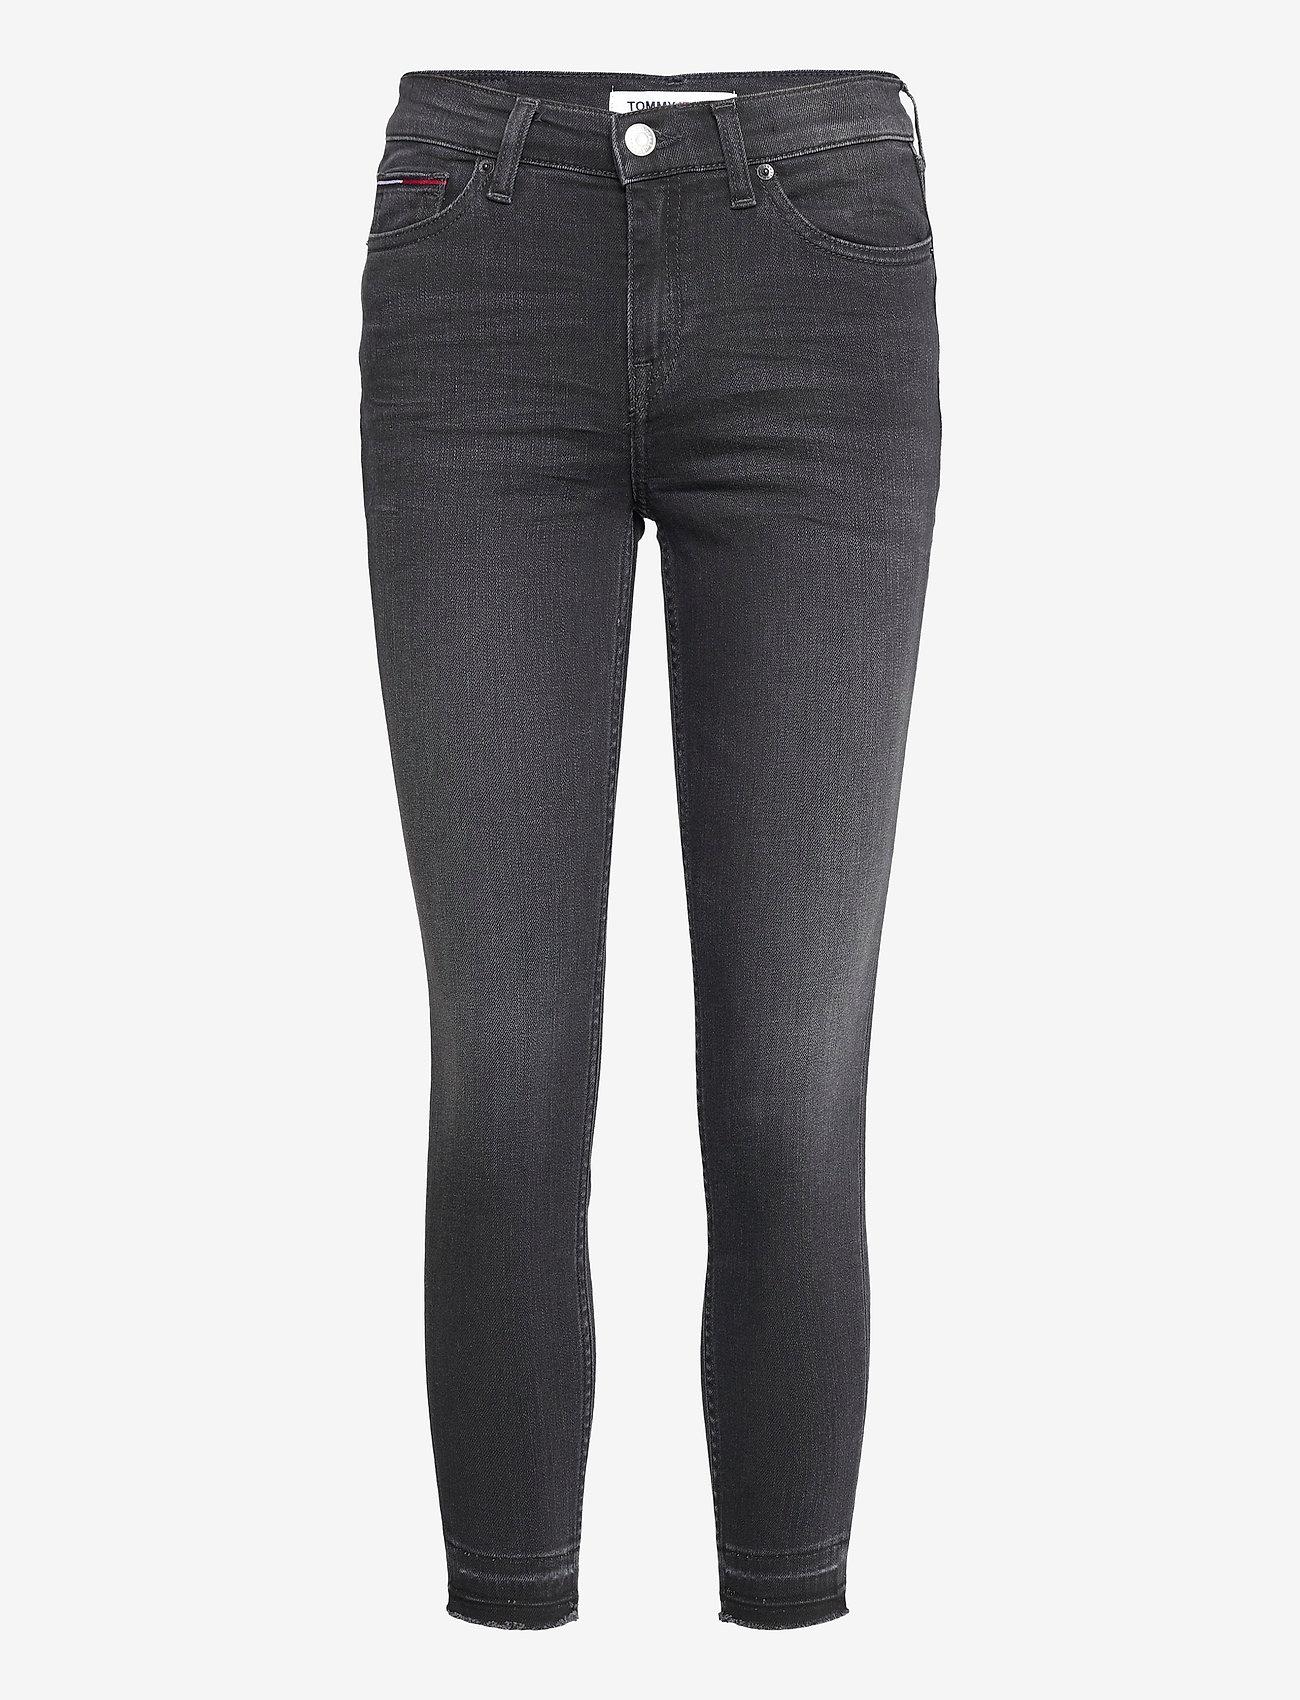 Tommy Jeans - NORA MR SKNY ANKLE  CSBBS - skinny jeans - ceasar bk bk str - 0